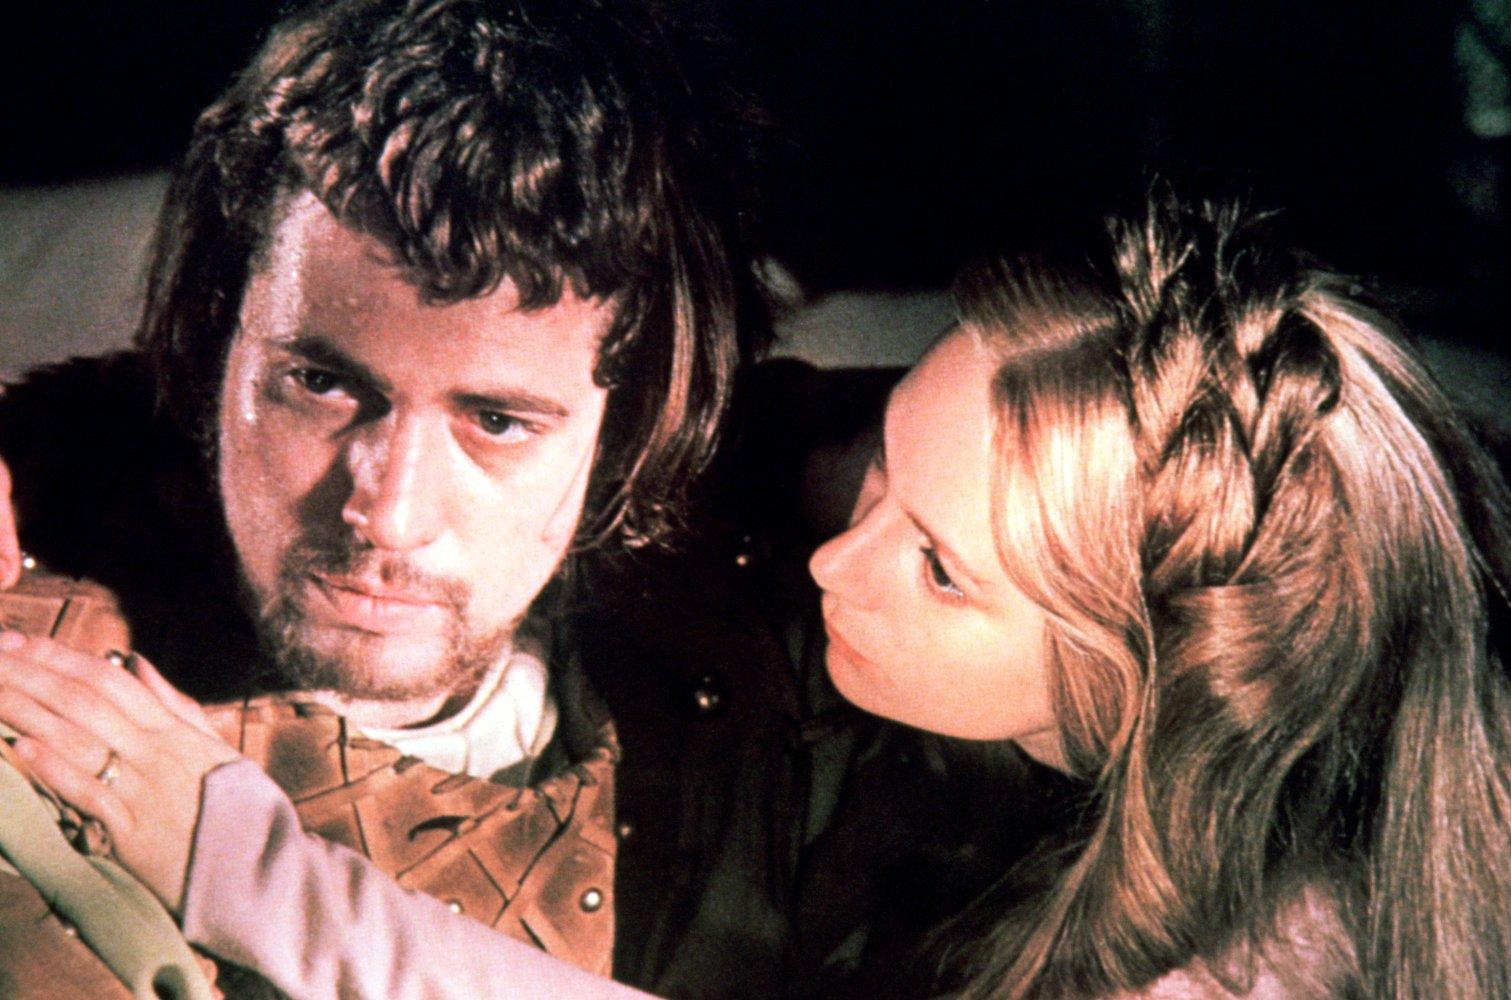 Macbeth (1971)